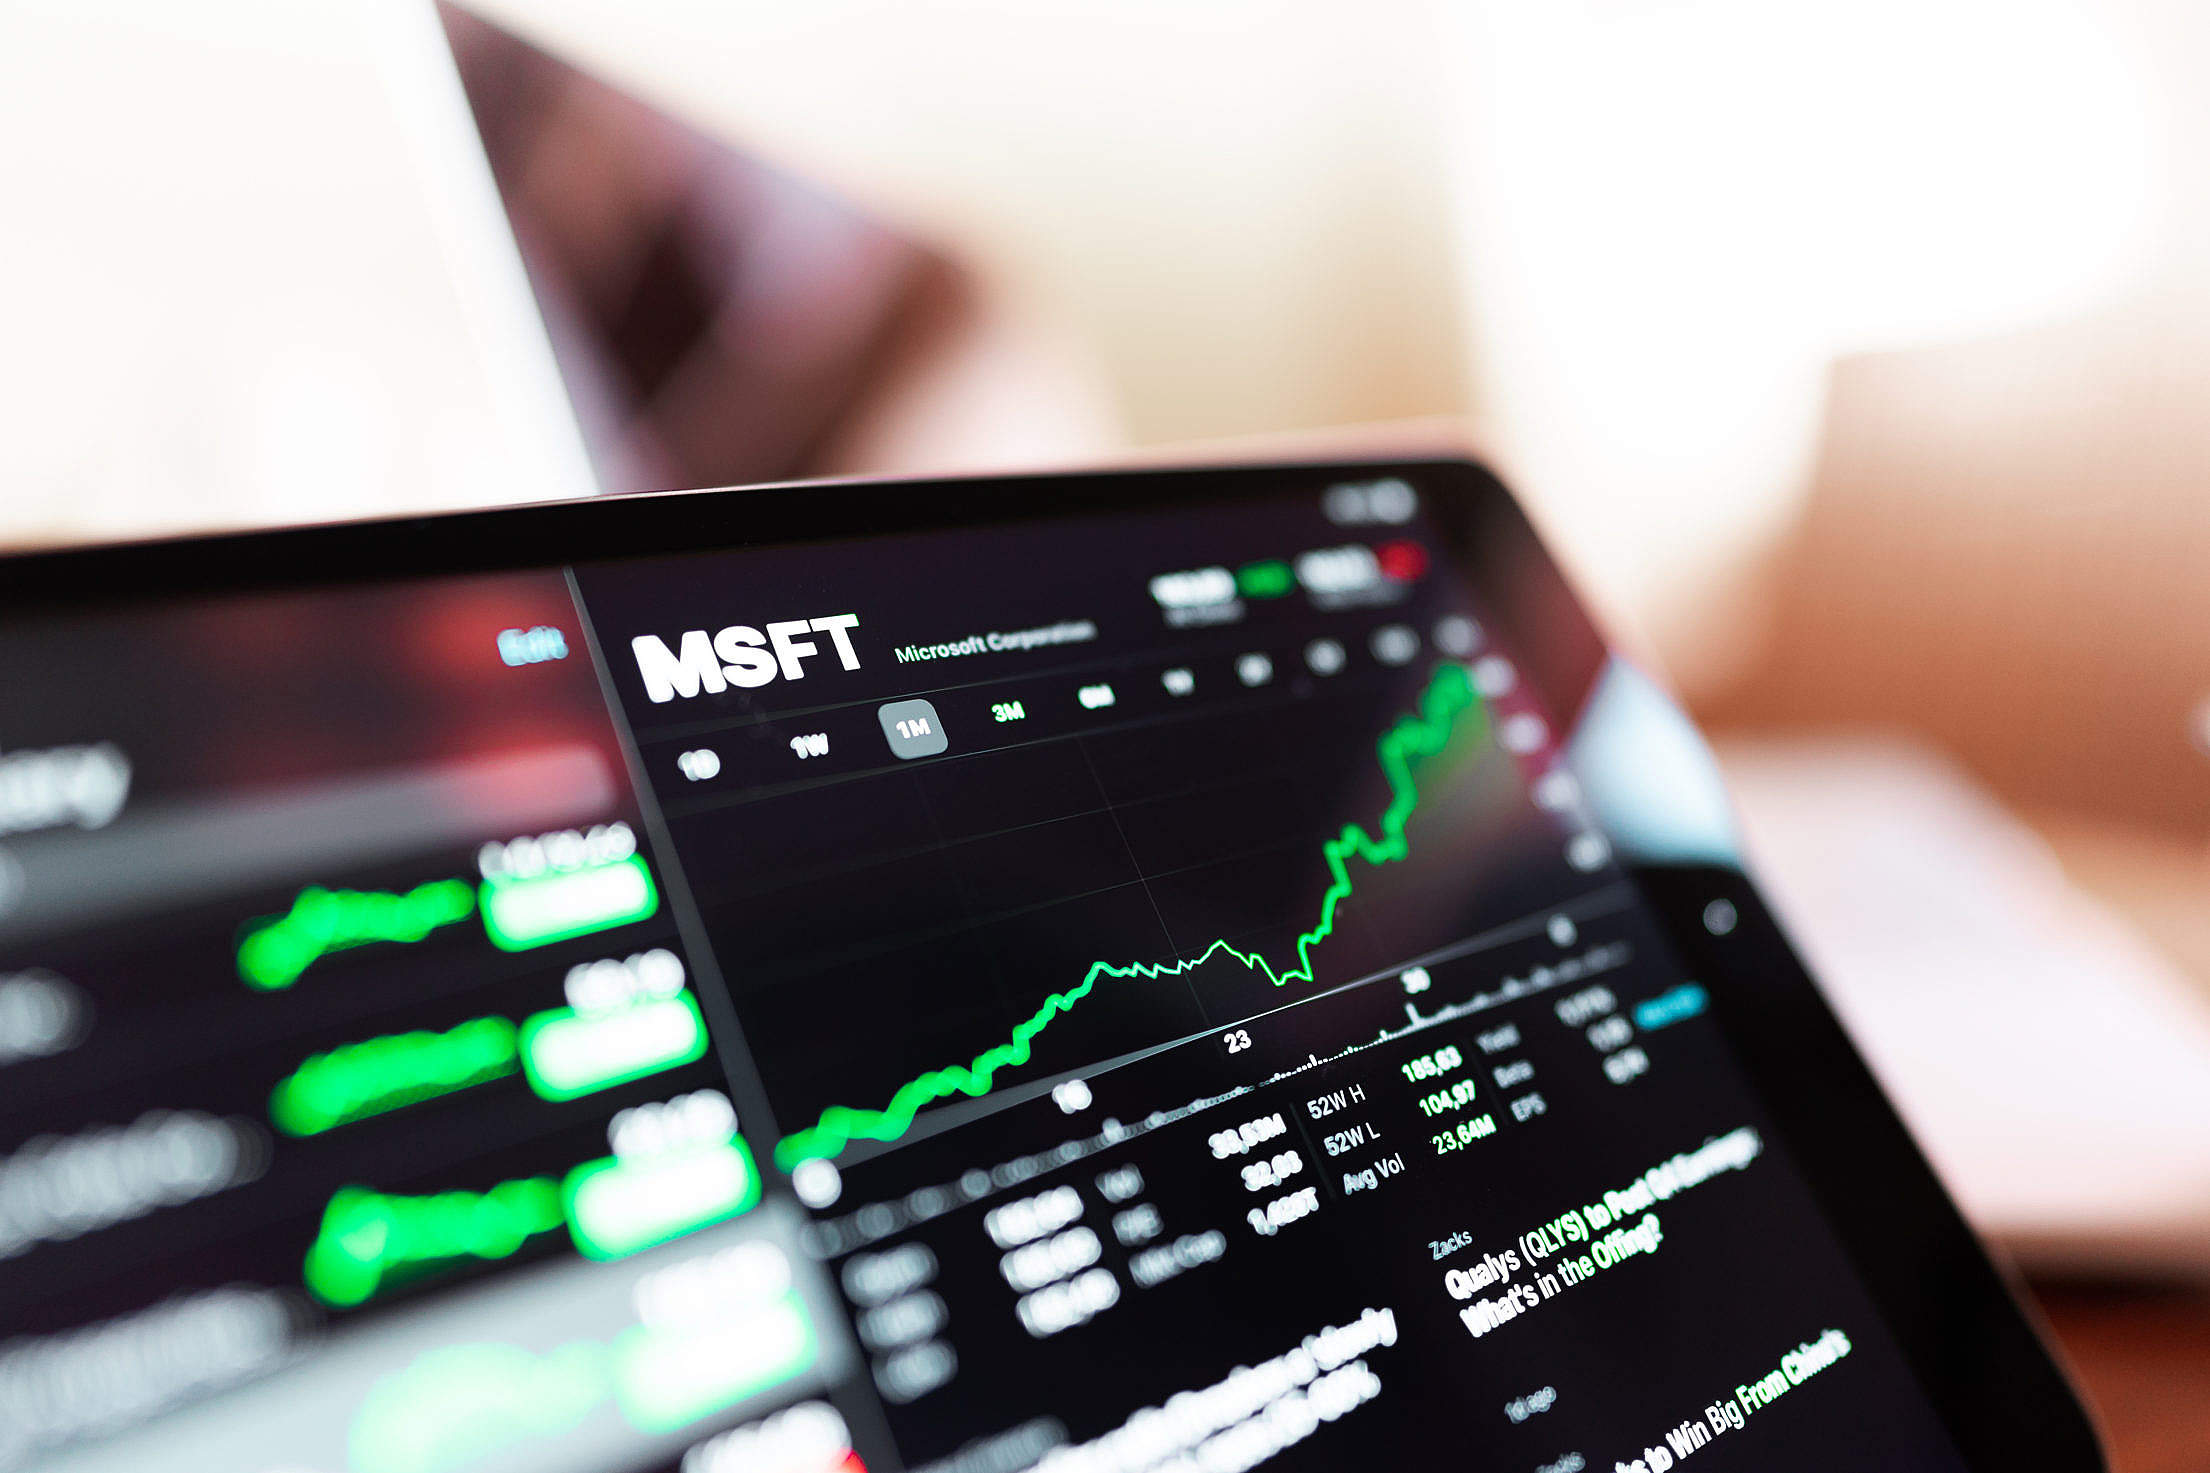 MSFT Stock Exchange Chart Free Stock Photo